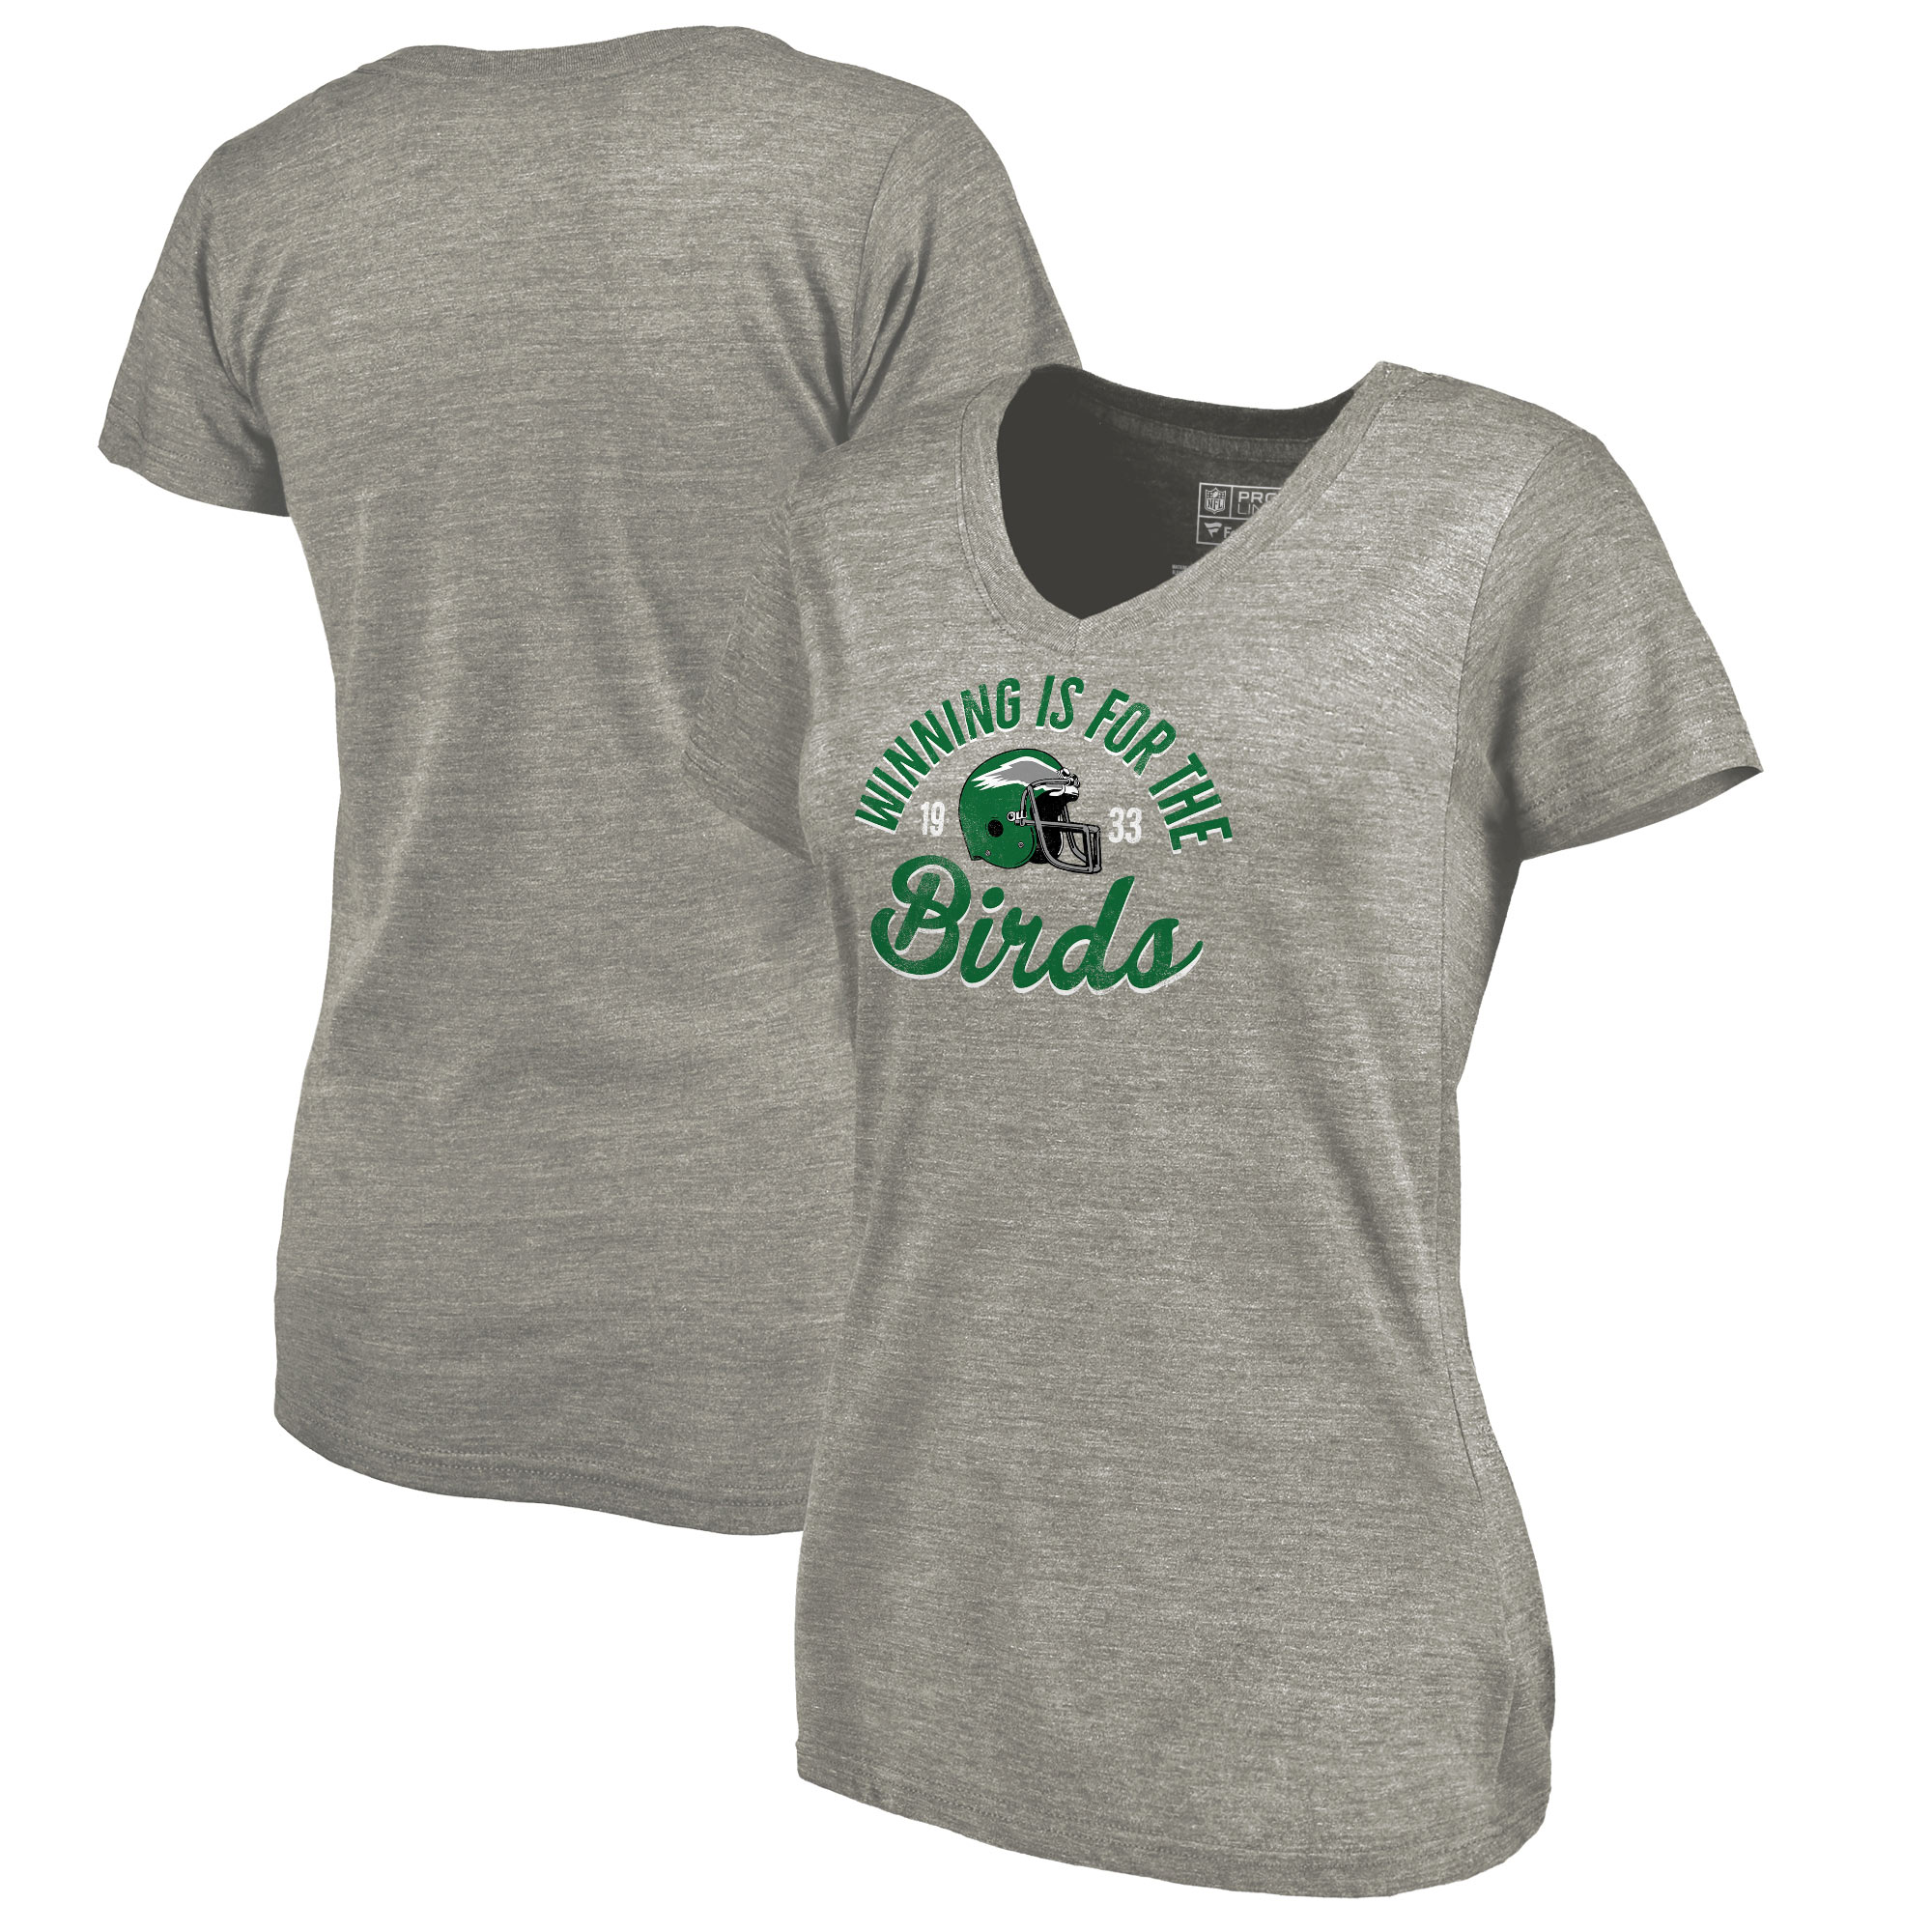 Philadelphia Eagles NFL Pro Line by Fanatics Branded Women's Hometown Collection Tri-Blend V-Neck T-Shirt - Heathered Gray